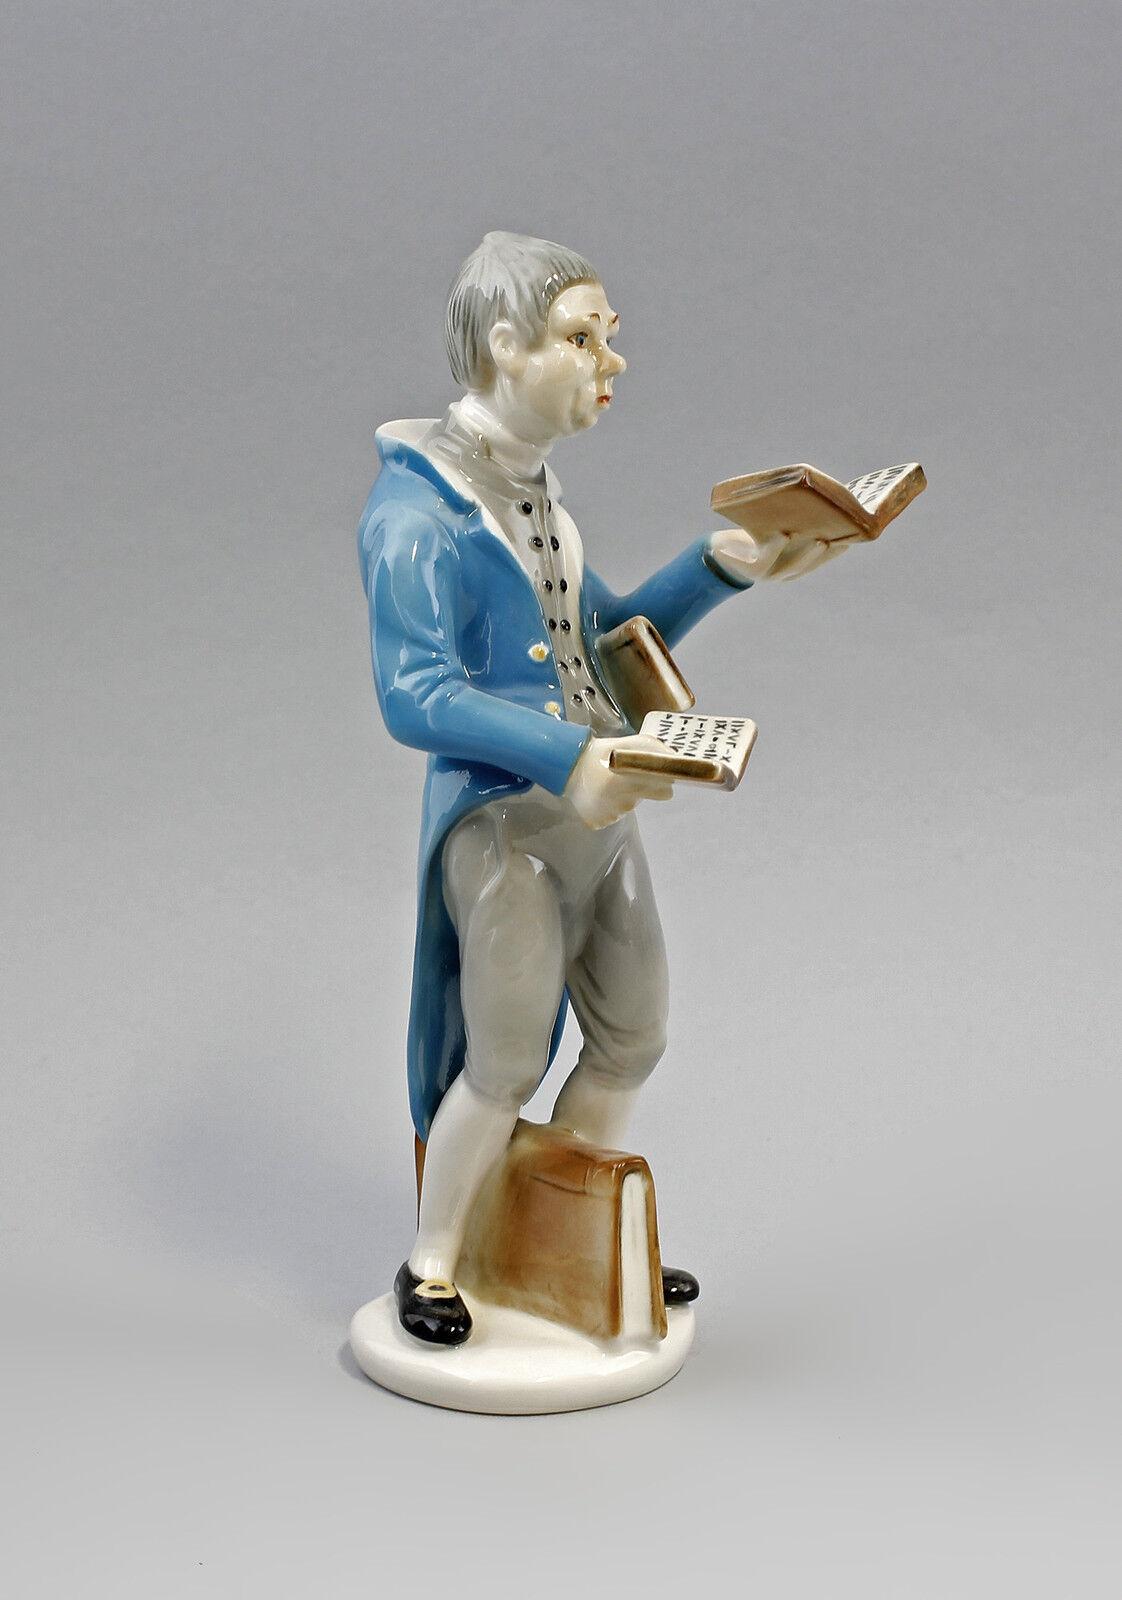 Porzellan Figur Bücherwurm nach Spitzweg Ens Ens Ens H22cm 9941595 d36511